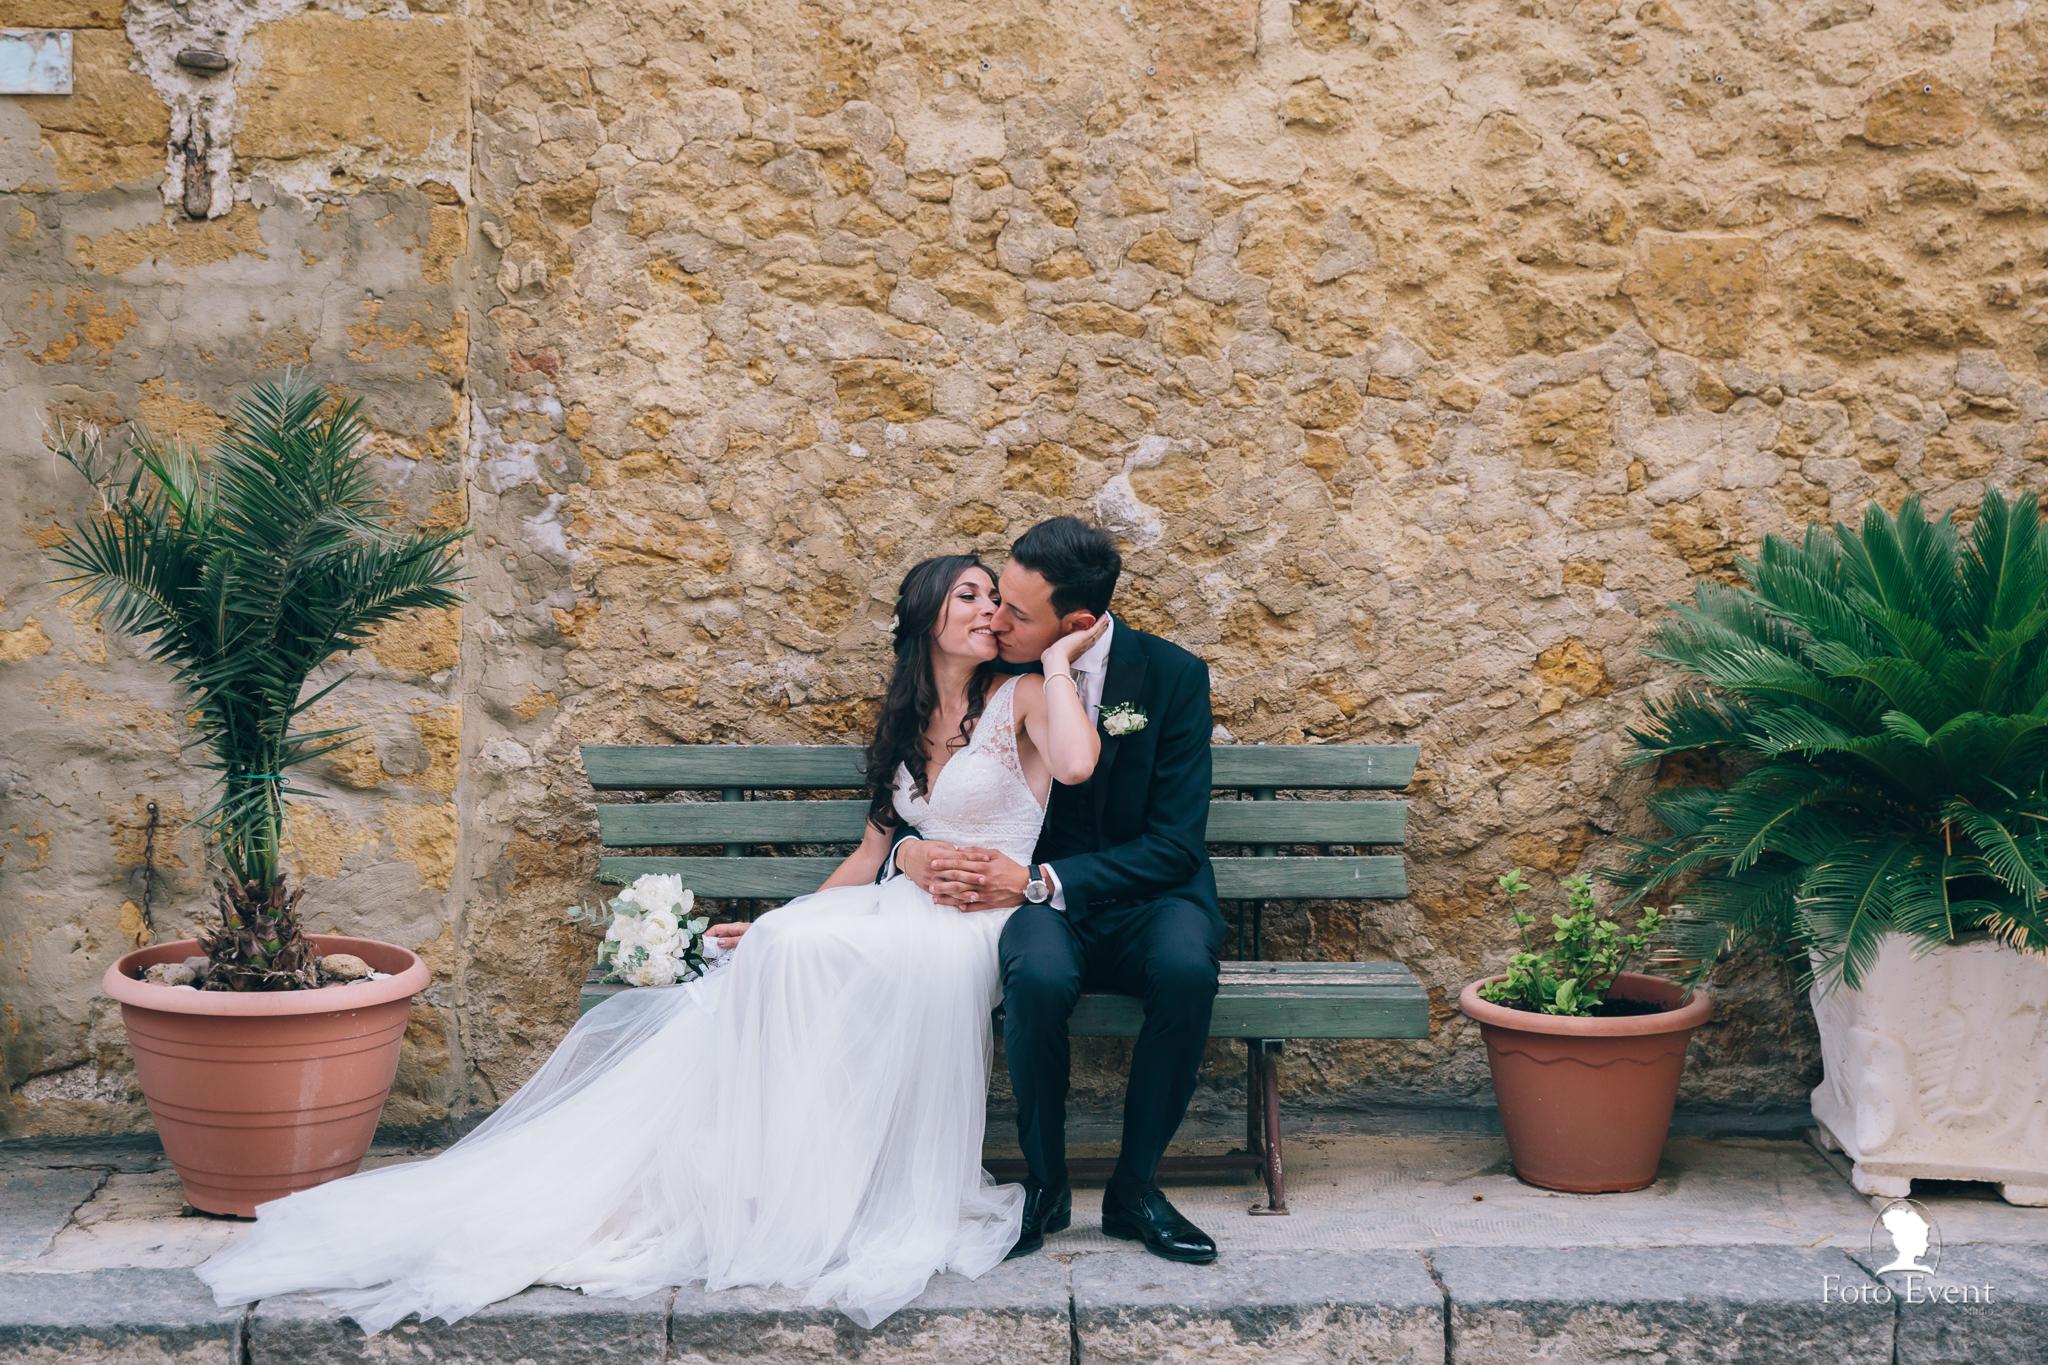 030-2019-08-23-Matrimonio-Lucia-e-Rosario-Scopelliti-5DE-1534